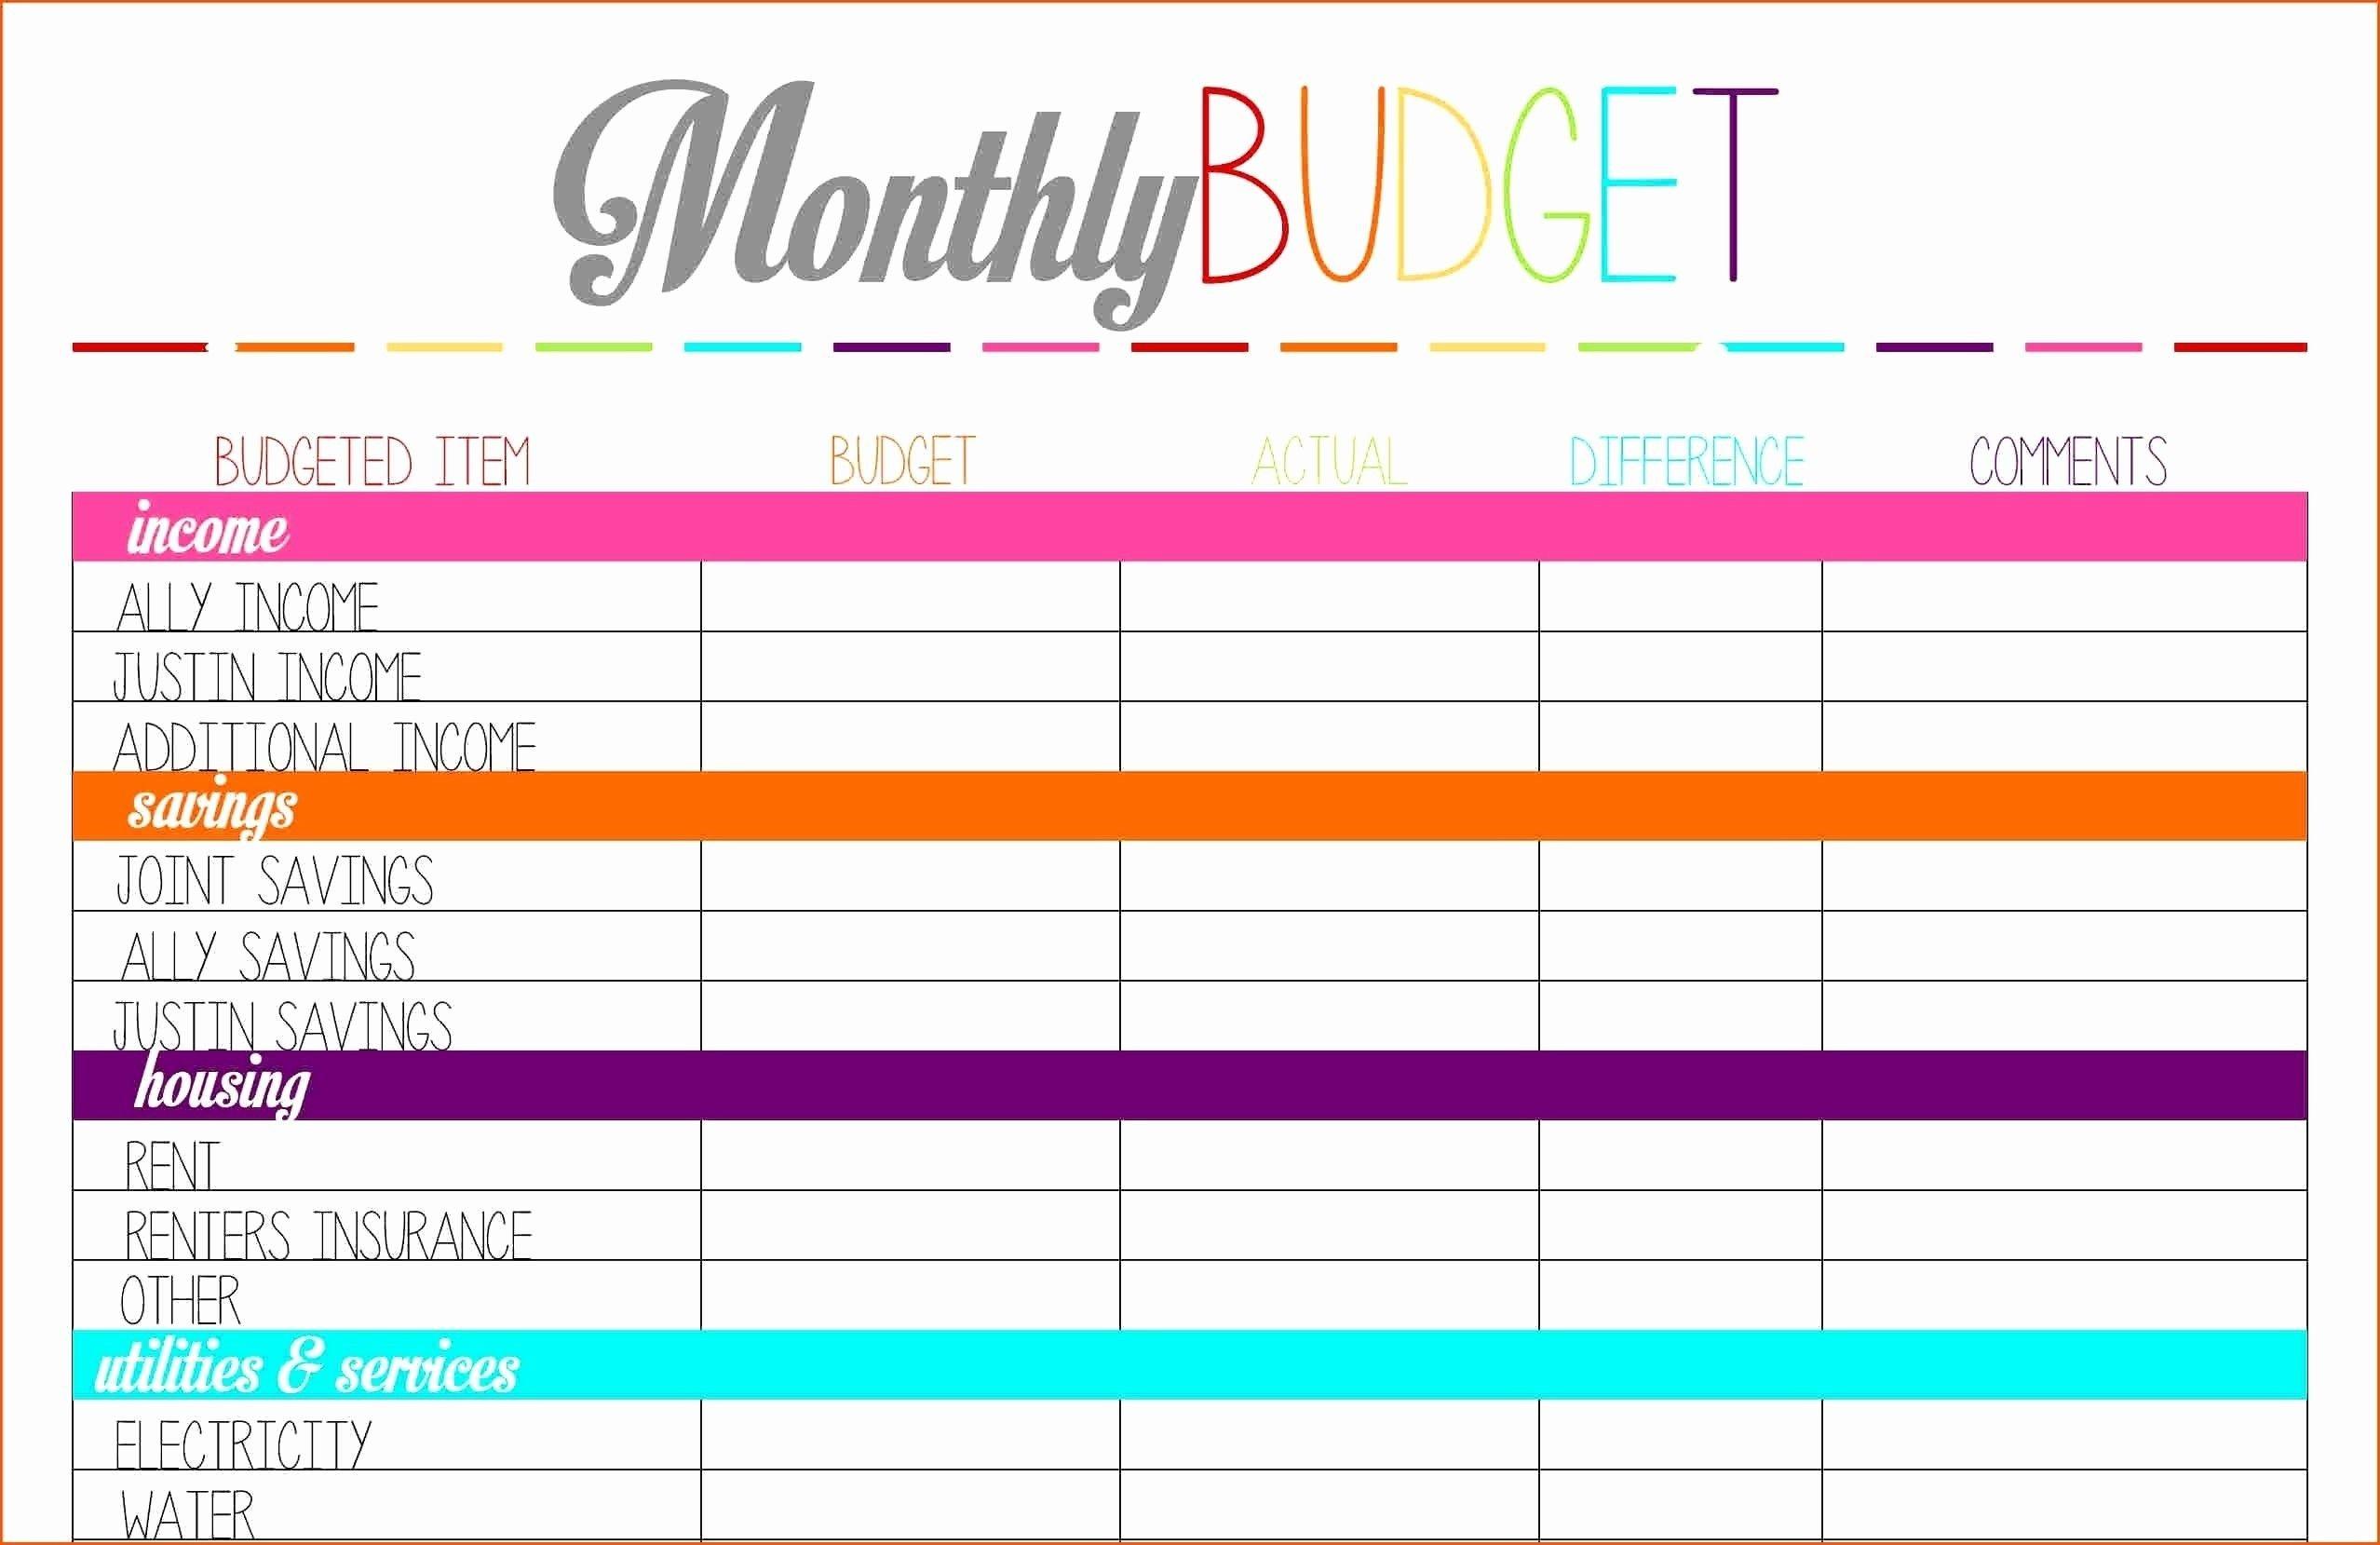 Budgeting For Dummies Worksheet  Briefencounters Together With Budgeting For Dummies Worksheet